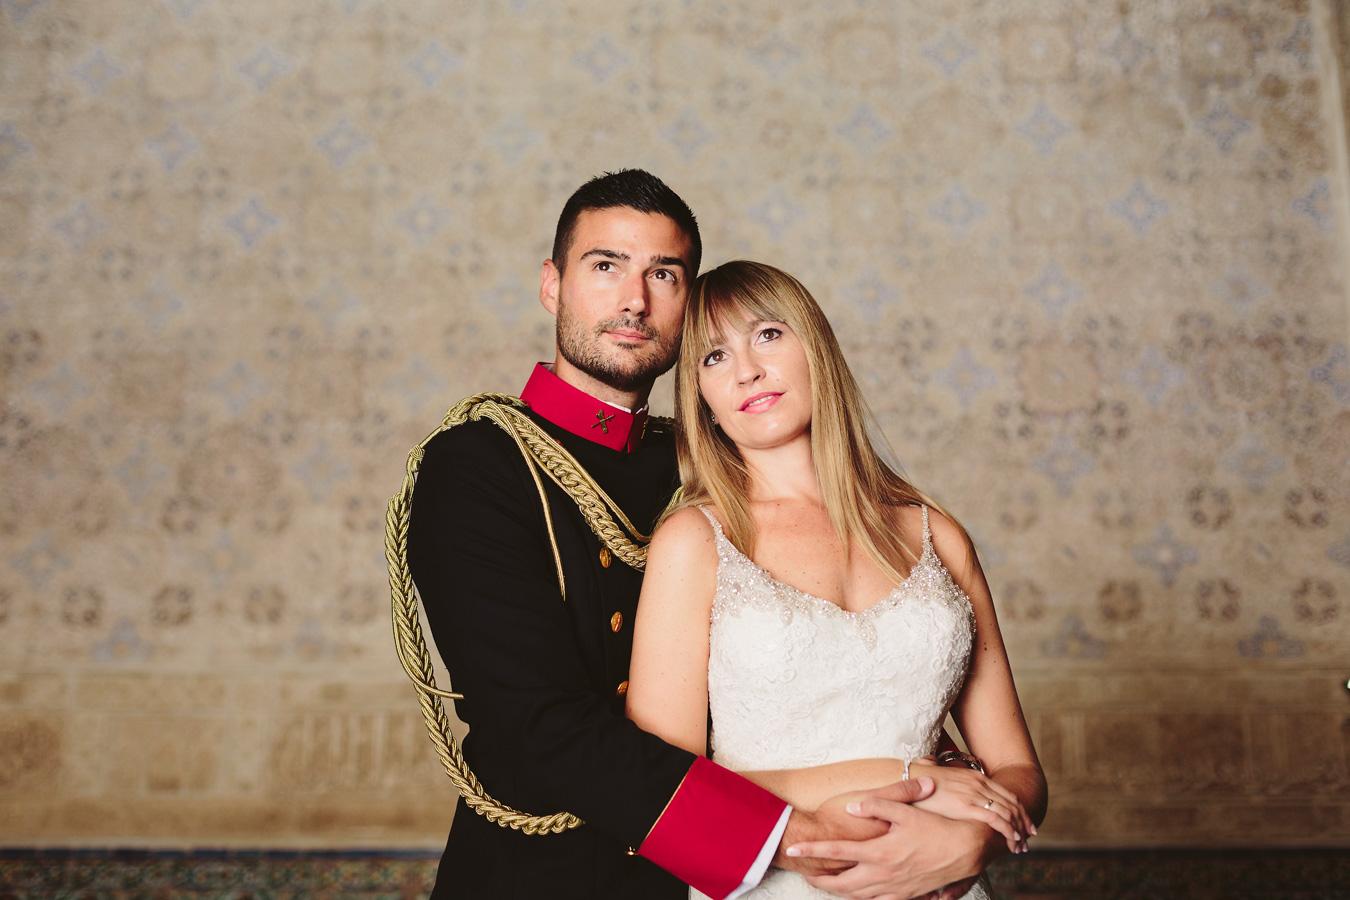 fotografo de boda en malaga granada alhambra boda civil